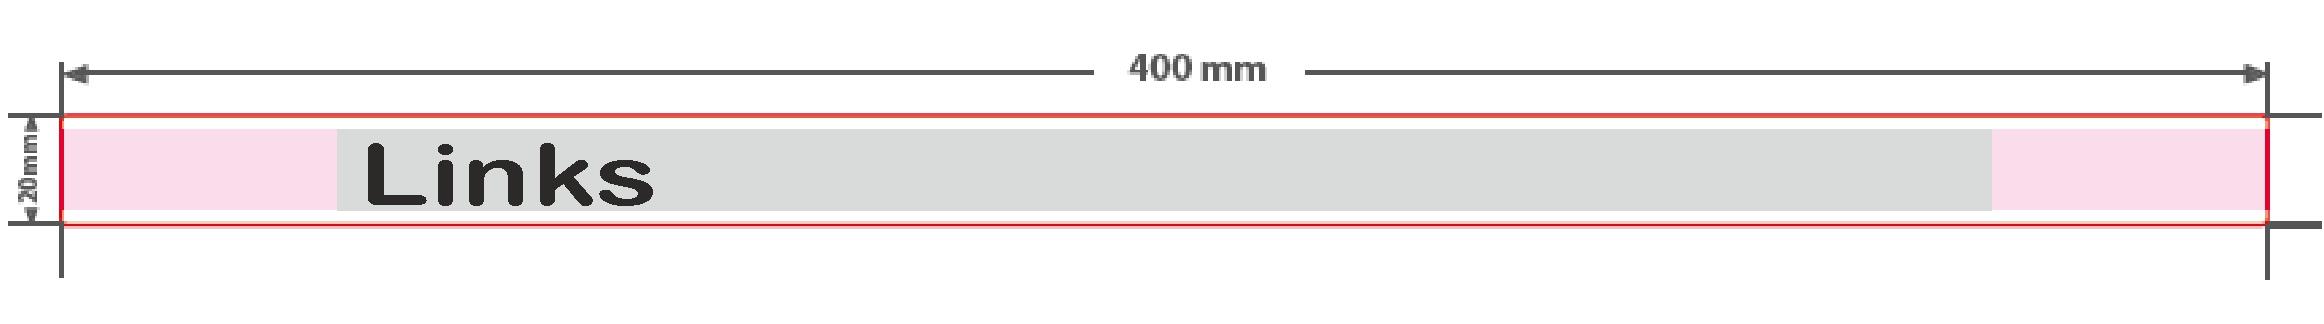 grillzange-textausrichtung-links